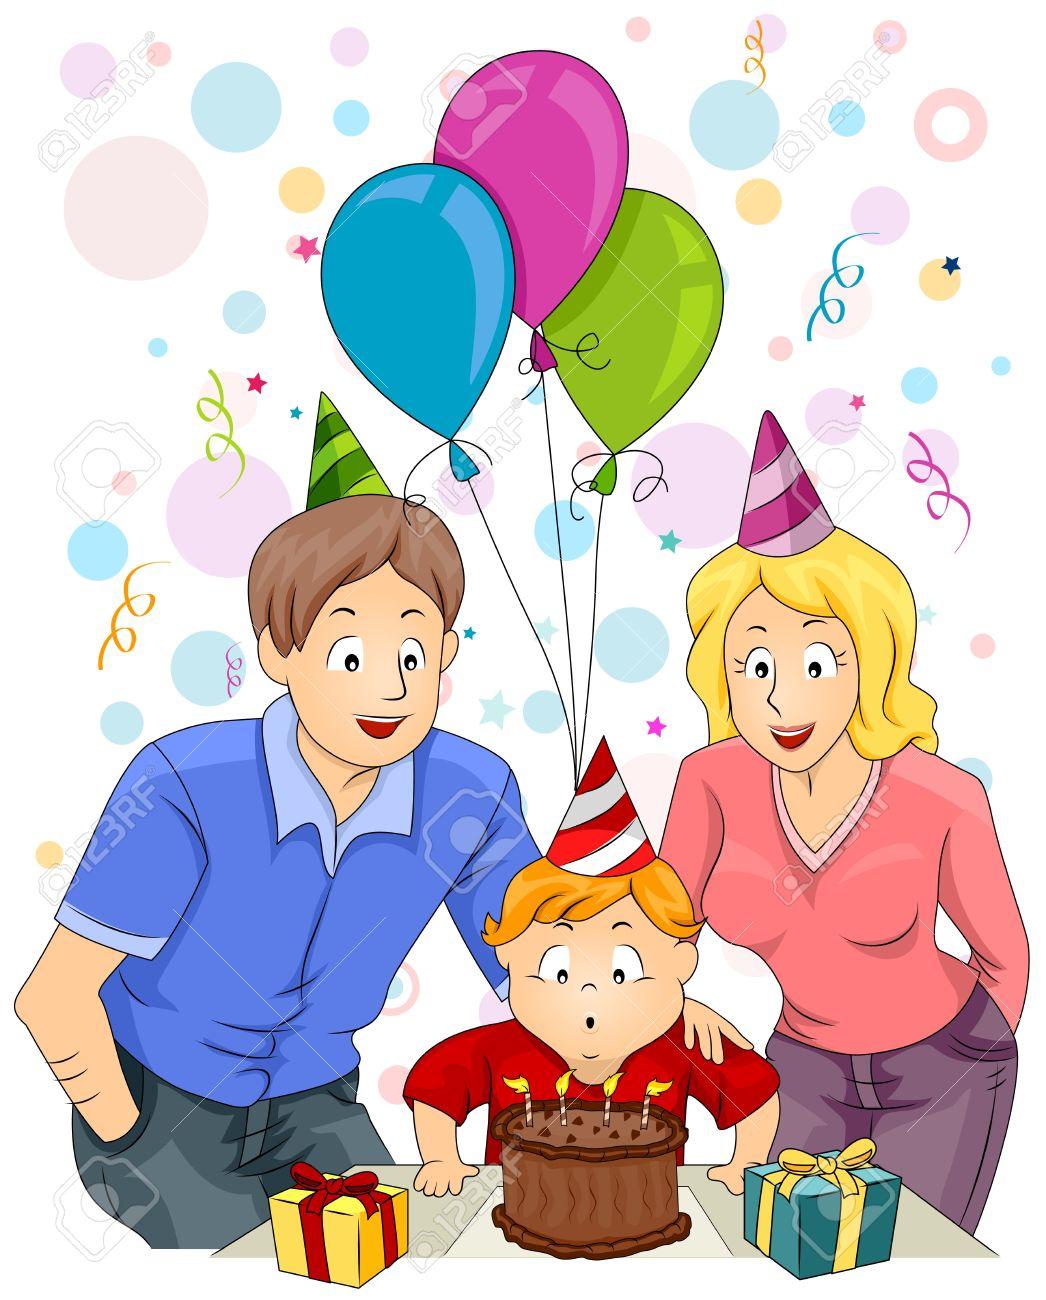 Birthday Celebration With Family Clipart.